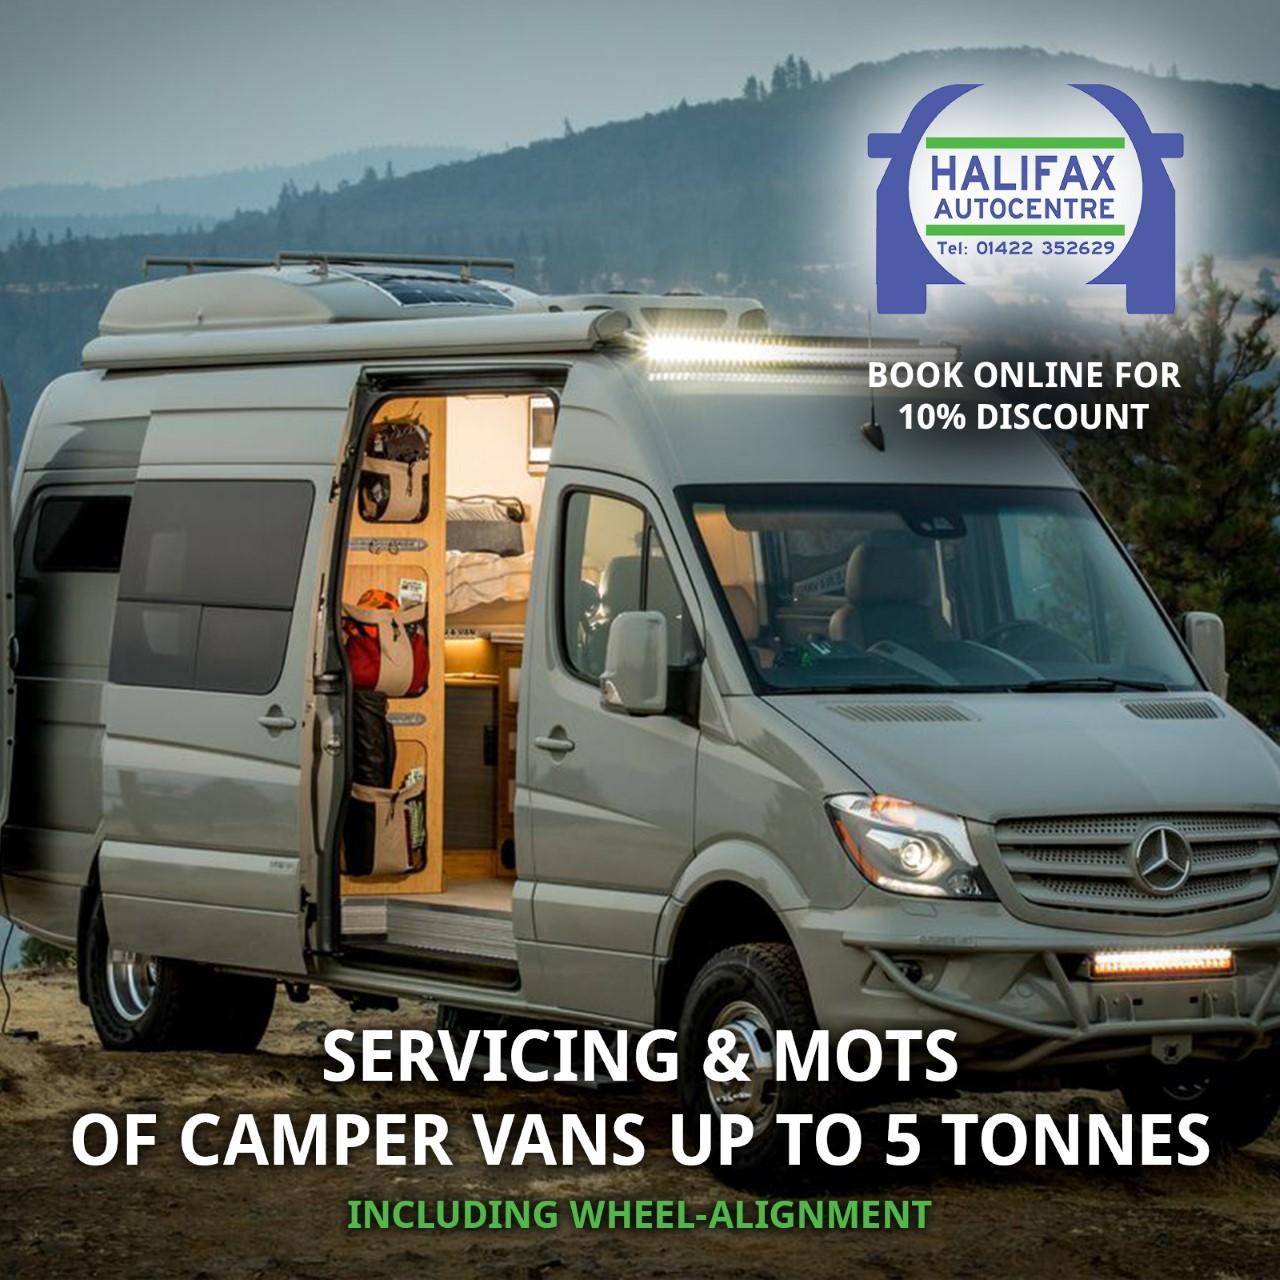 Halifax Autocentre - Campervan Servicing